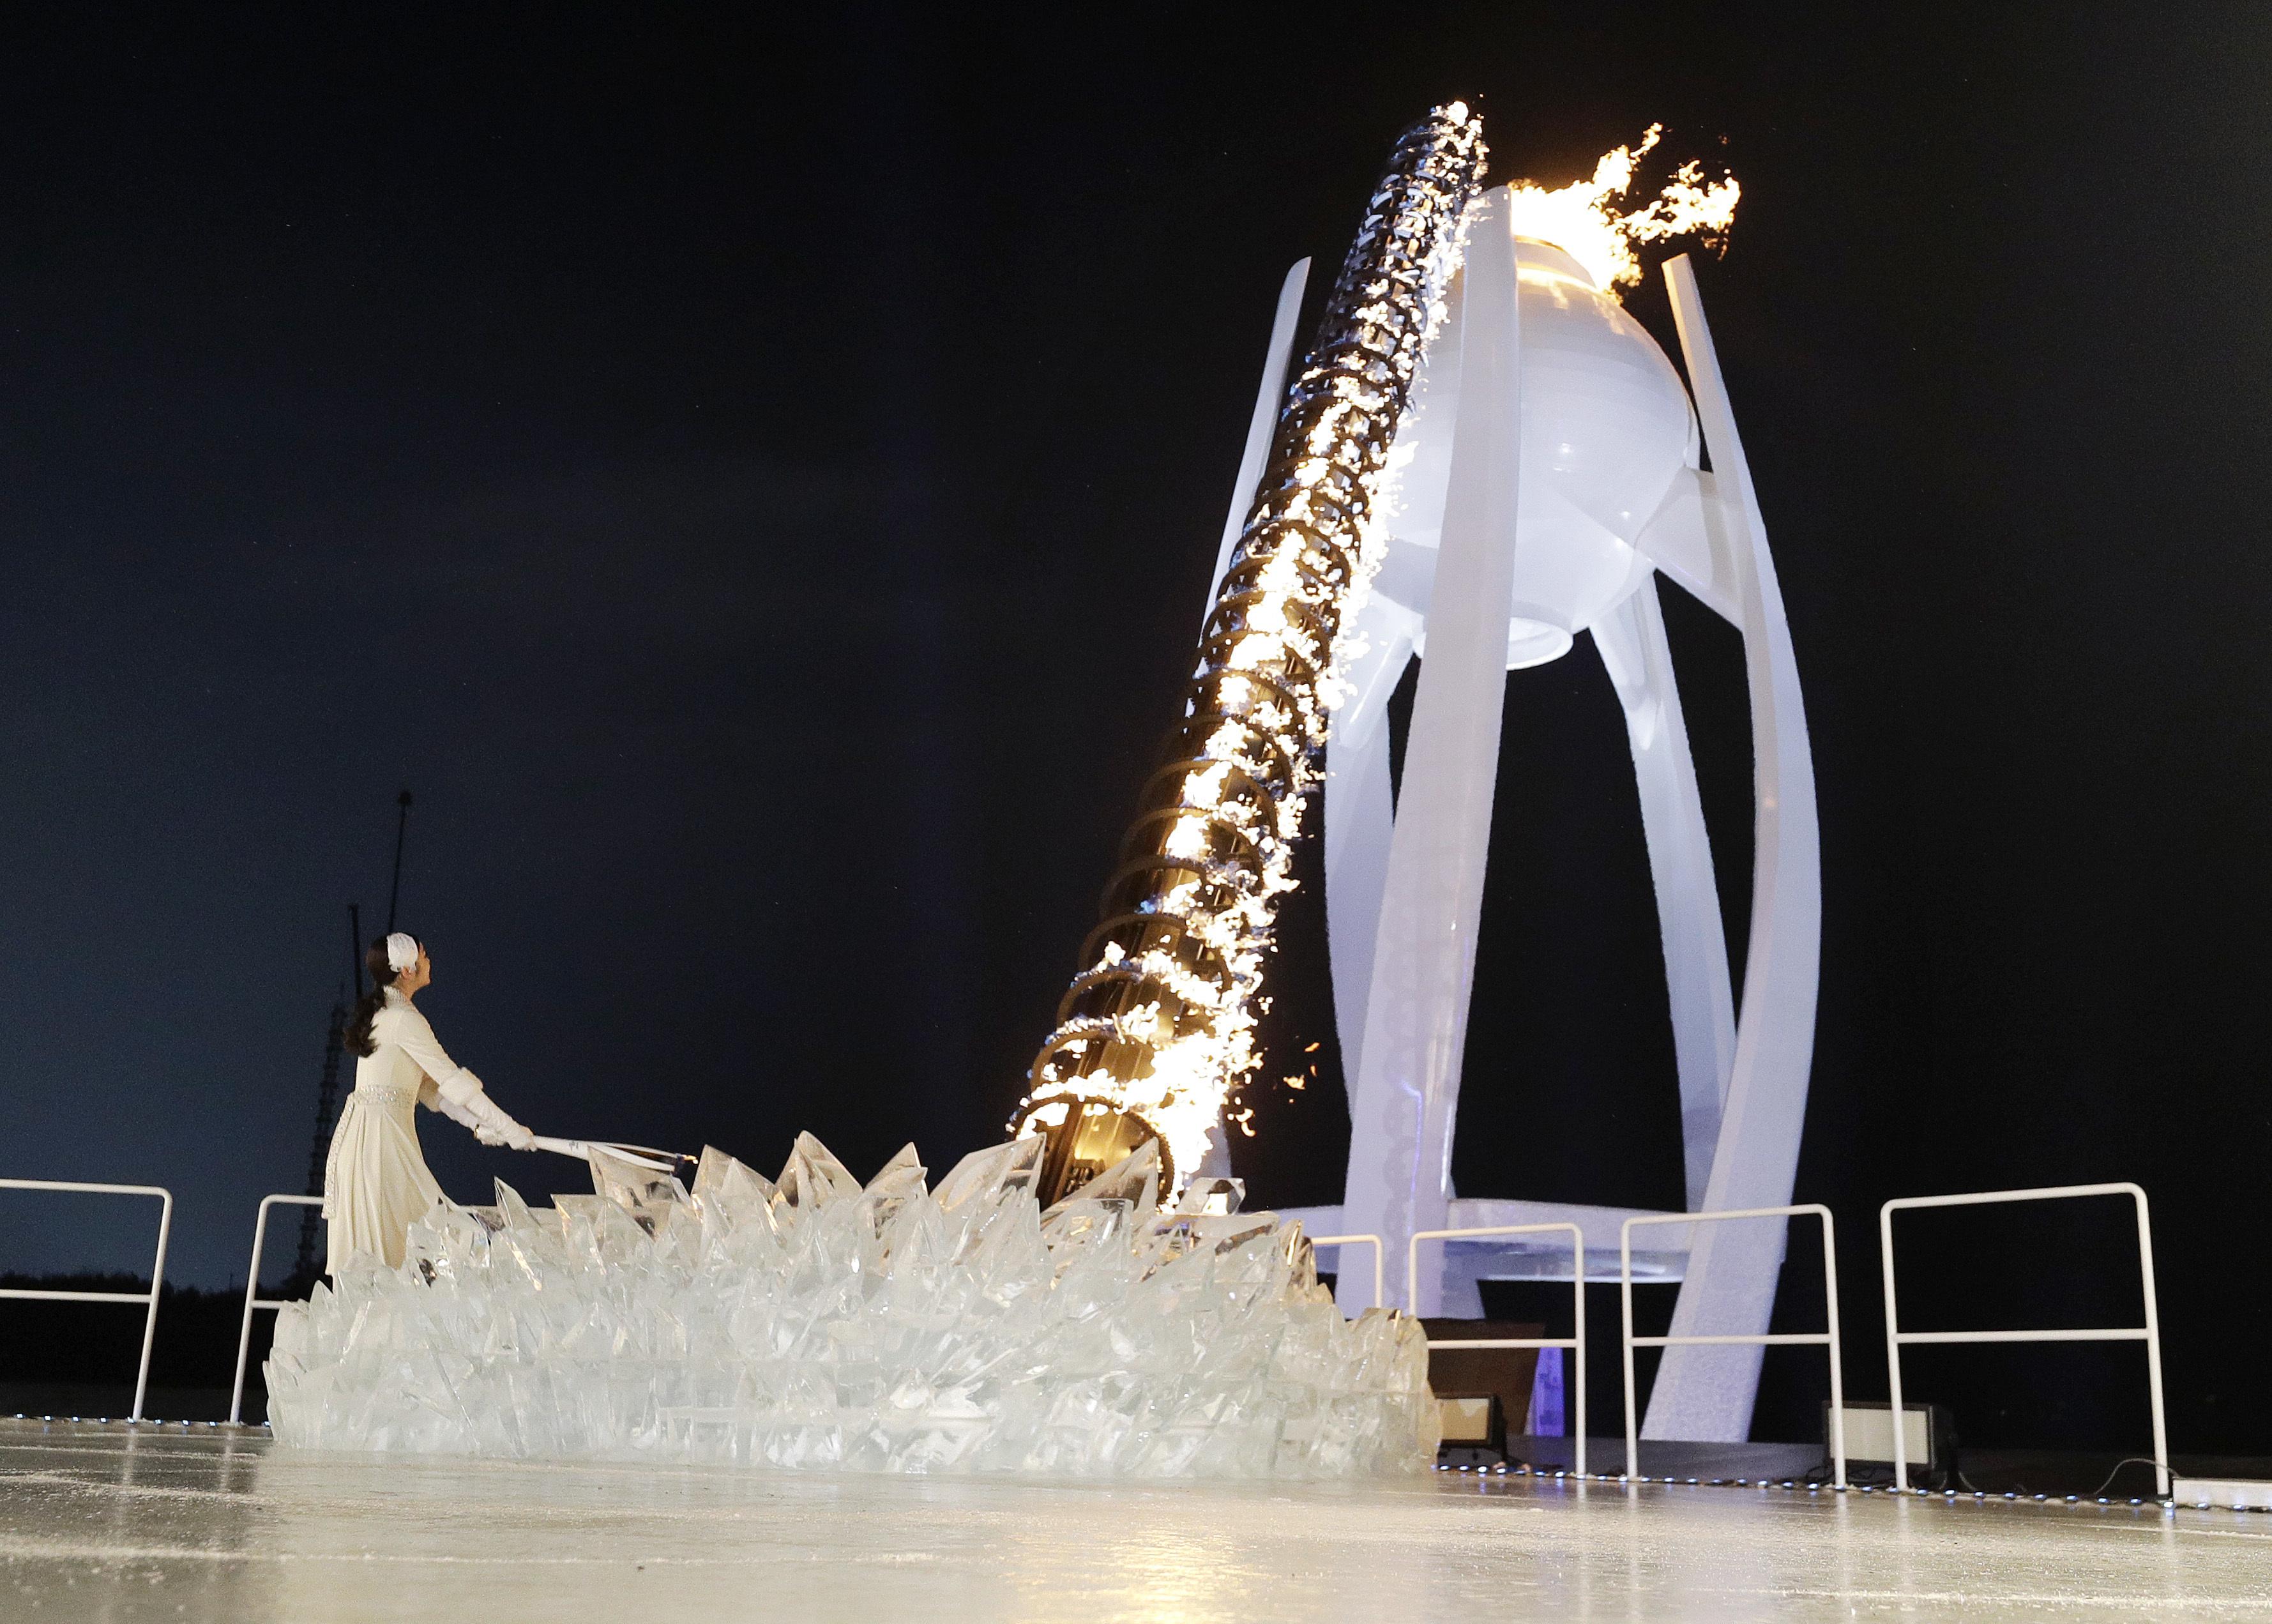 With extraordinary political optics, Winter Olympics begin